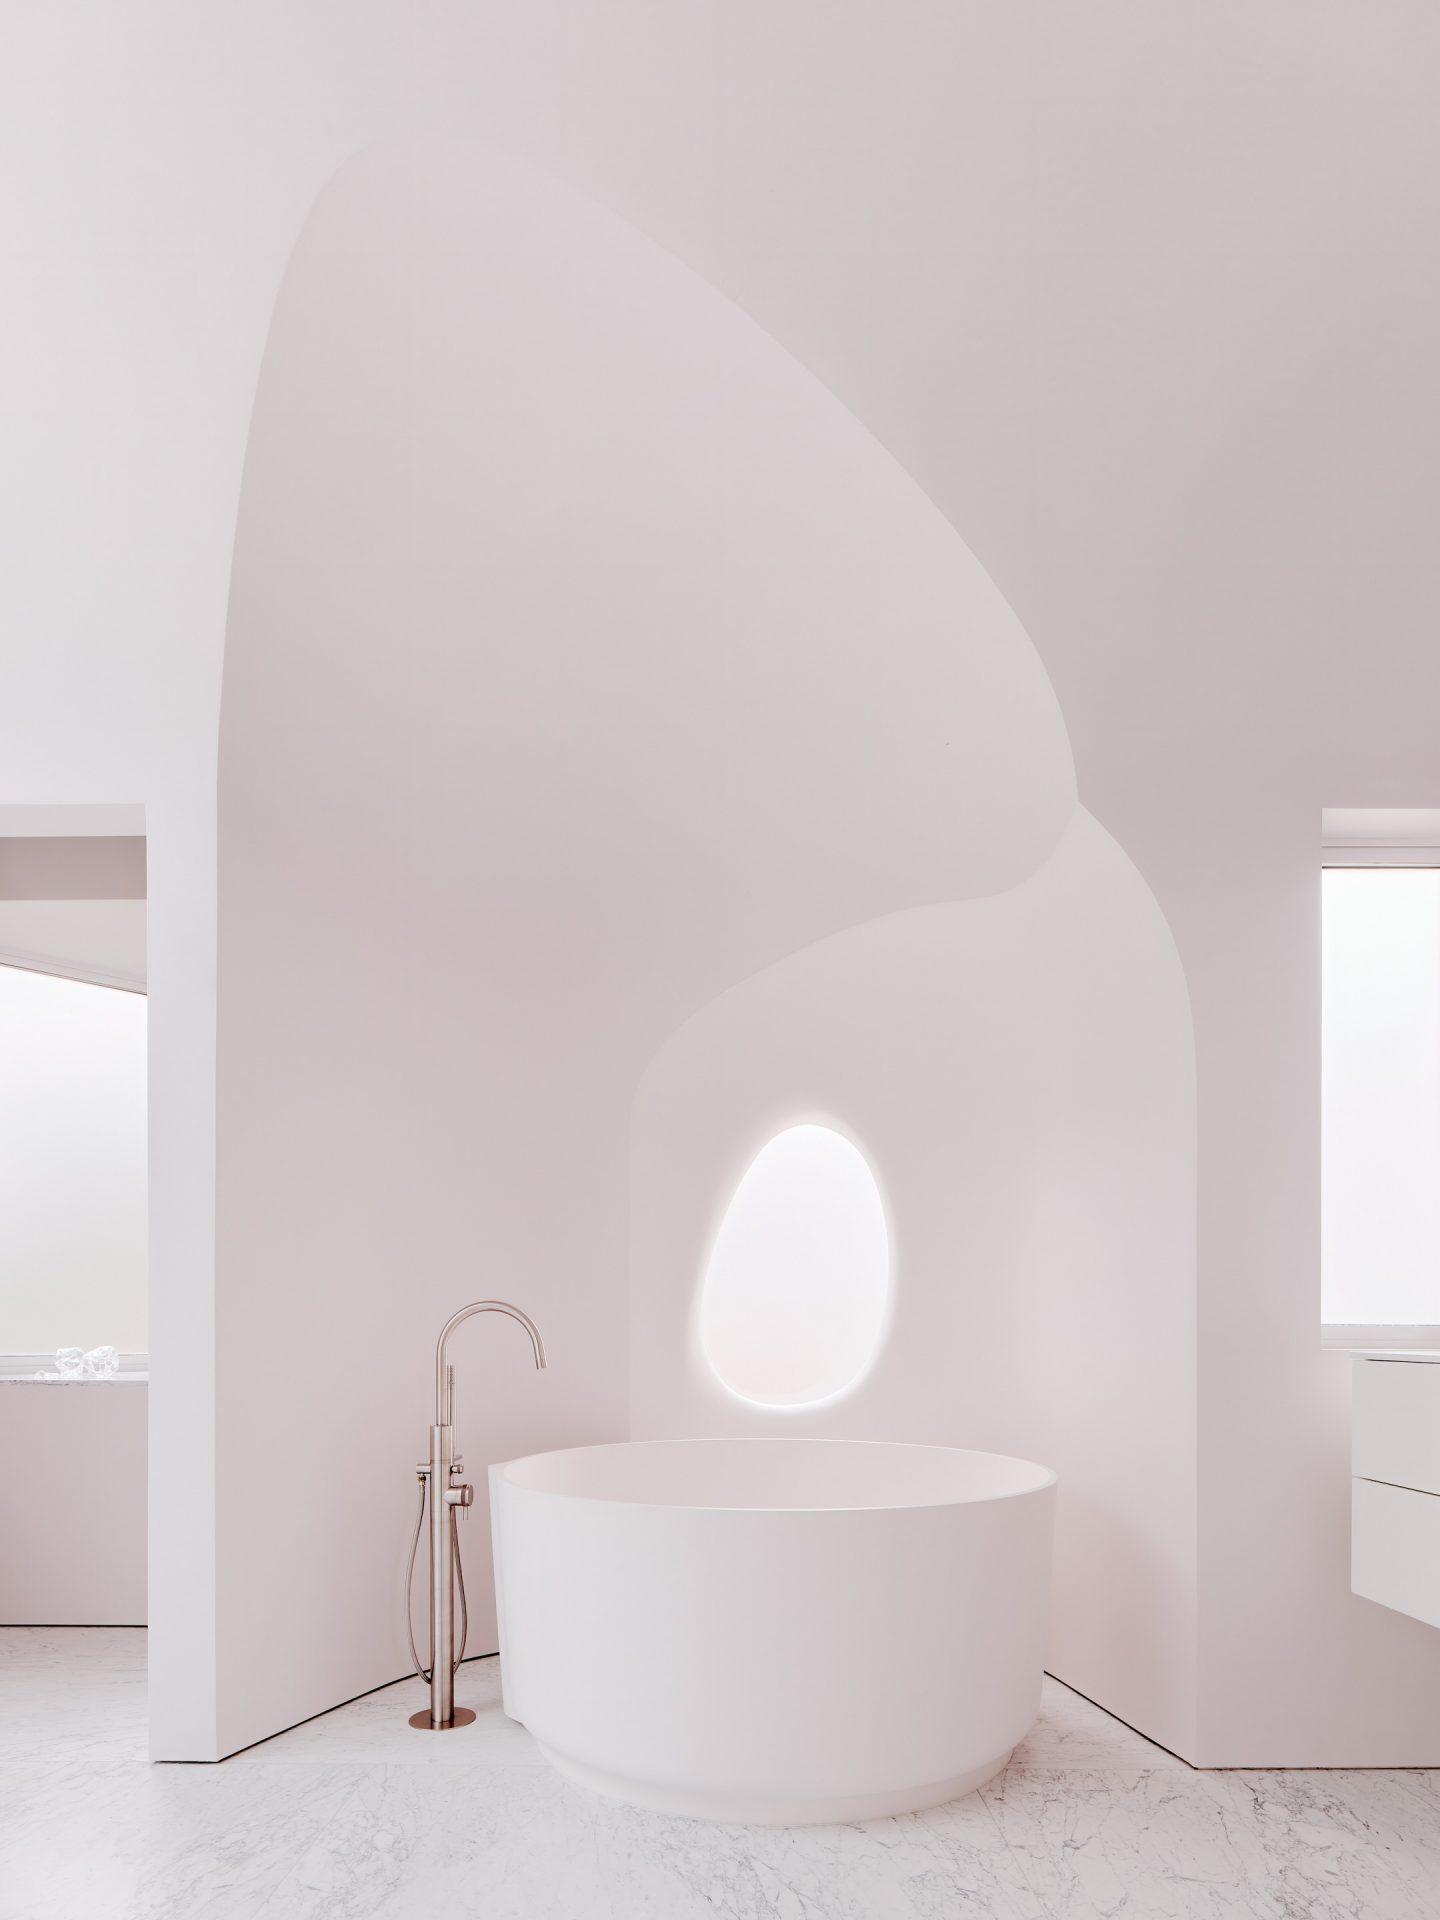 IGNANT-Architecture-Opa-Softie-01